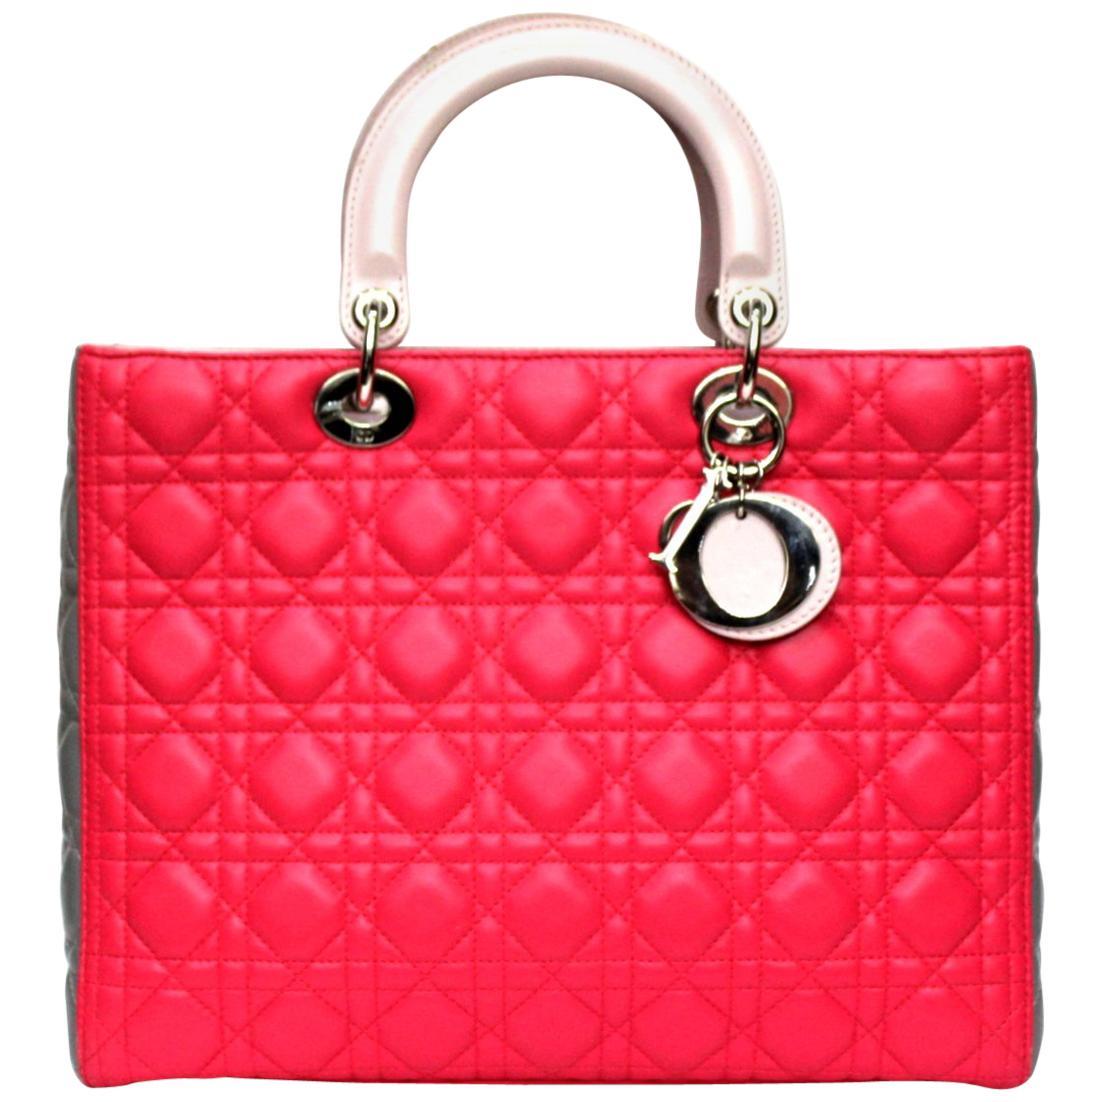 Christian Dior Lady Dior Tri-color Tote Bag